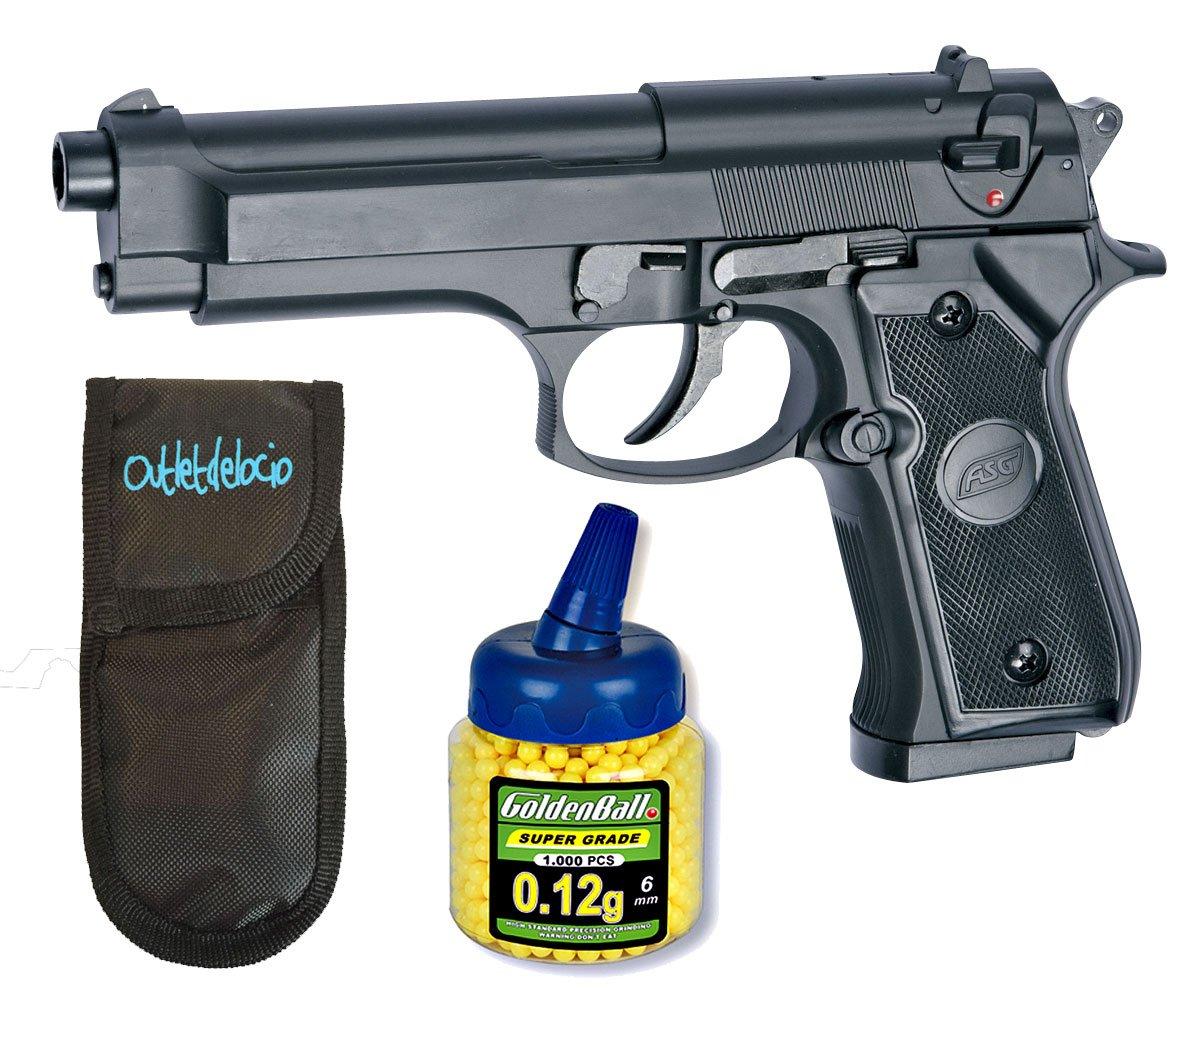 Pack Pistola airsoft M92 negra. Calibre 6mm. + Funda portabalines + Biberon 1000 bolas. 23054/21993 ASG